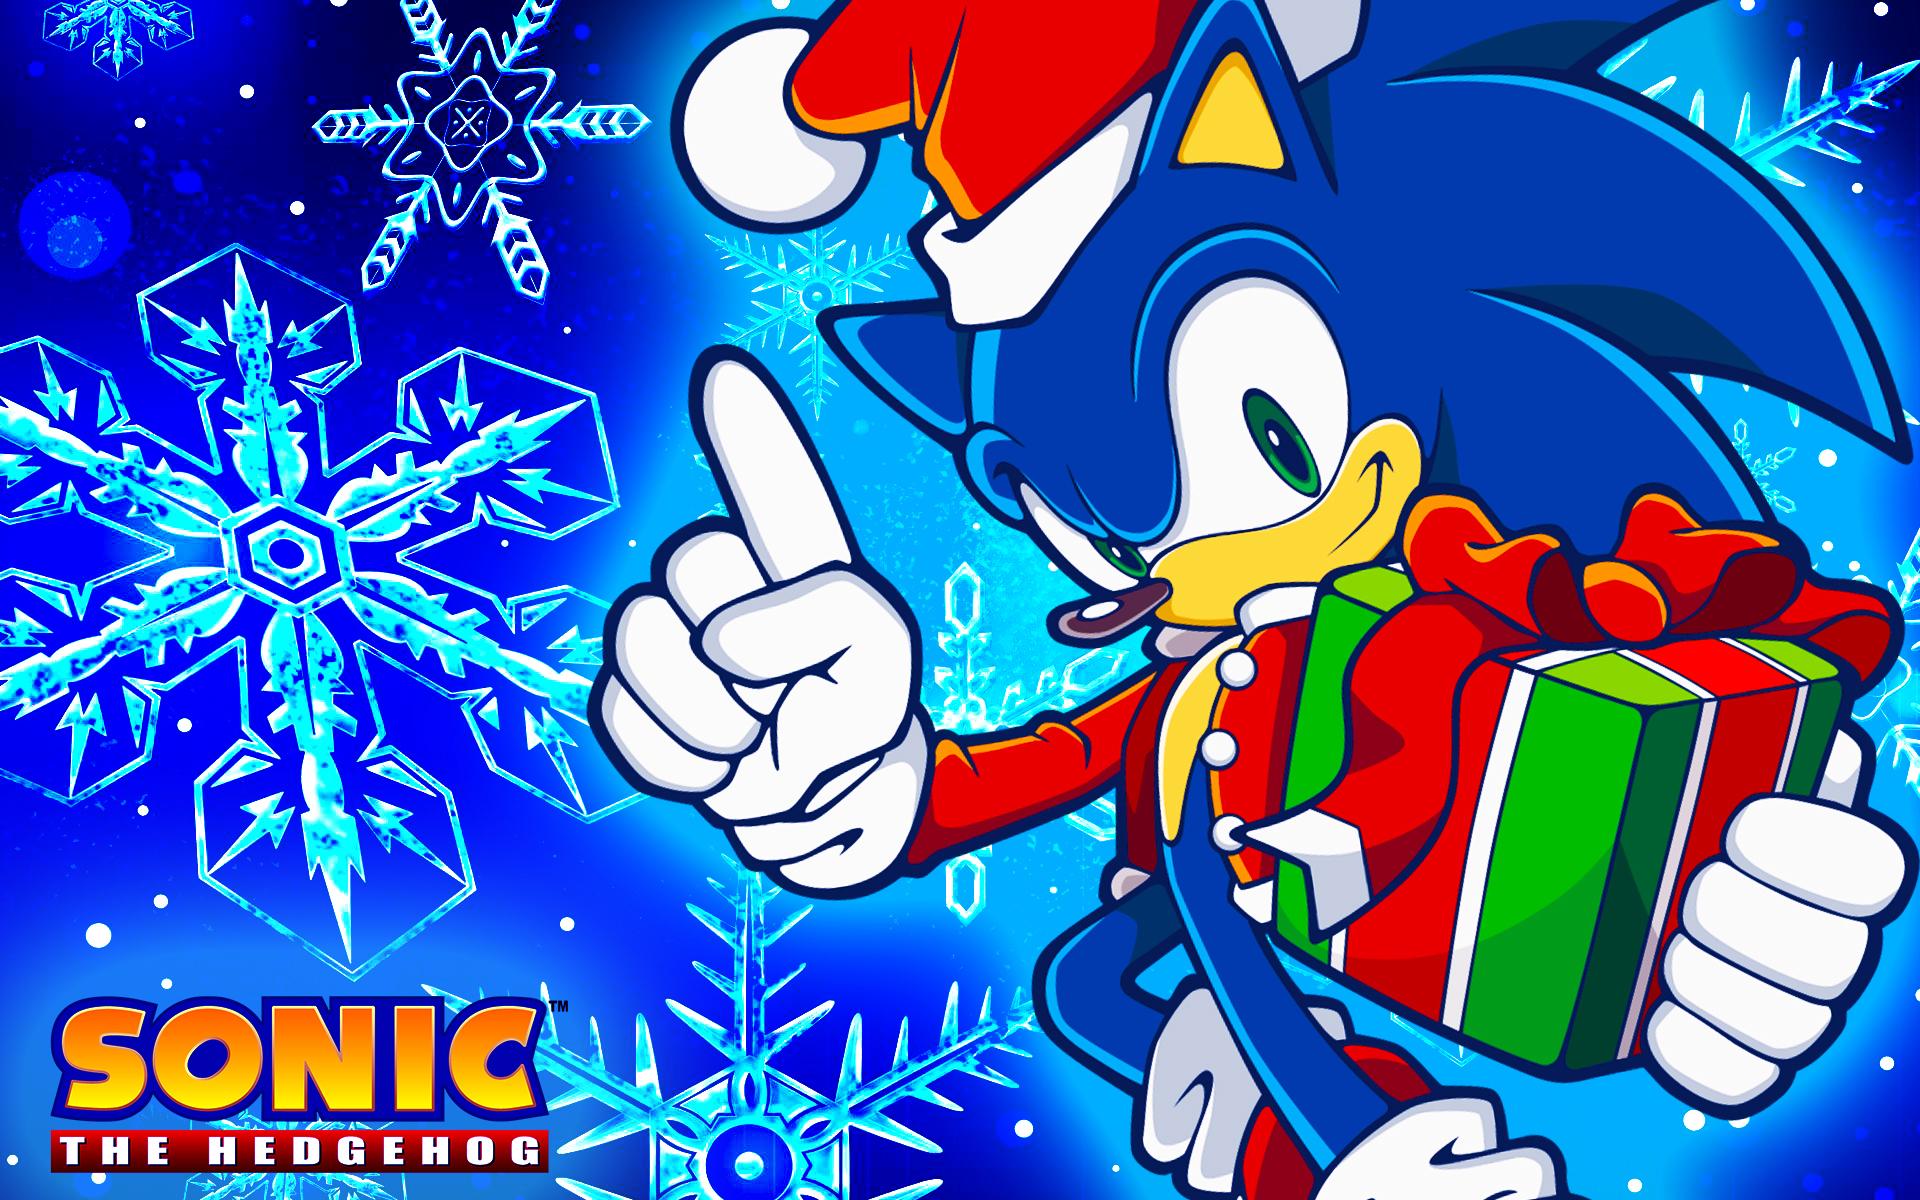 Christmas Sonic Wallpaper by SonicTheHedgehogBG on DeviantArt